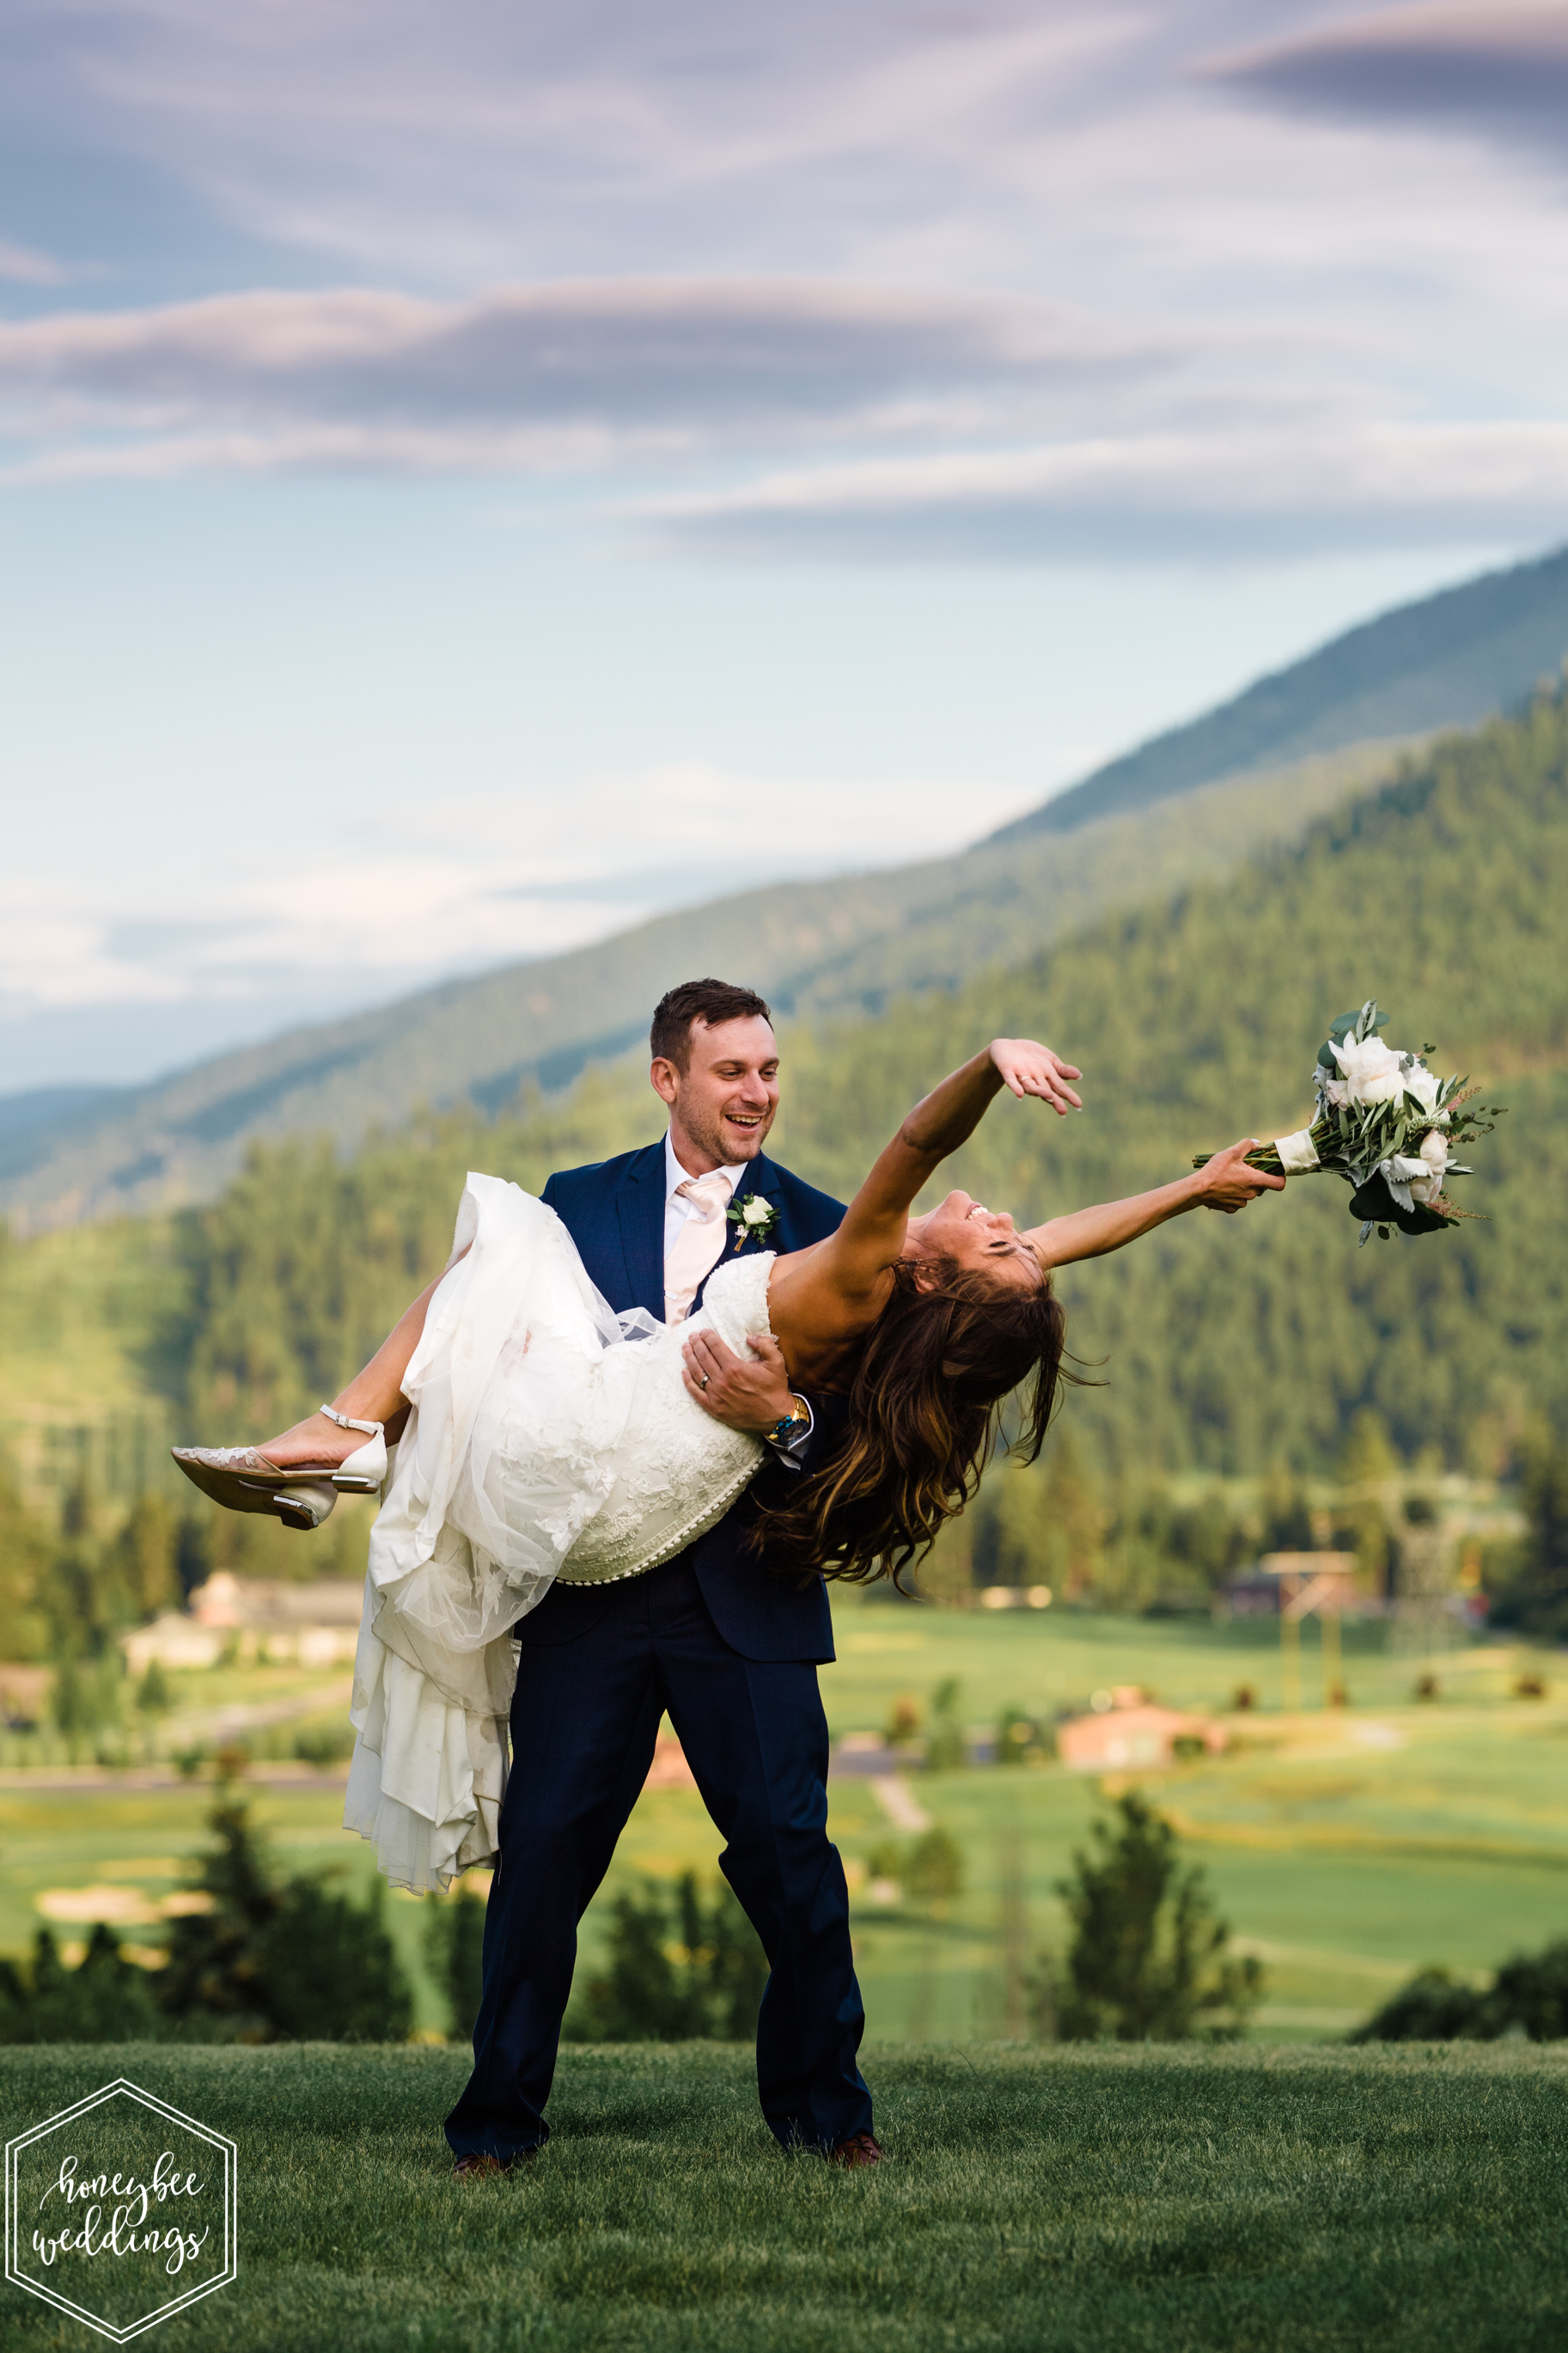 120Montana Wedding Photographer_Missoula Wedding_Honeybee Weddings_Devlin & Jacob_June 22, 2019-2288.jpg